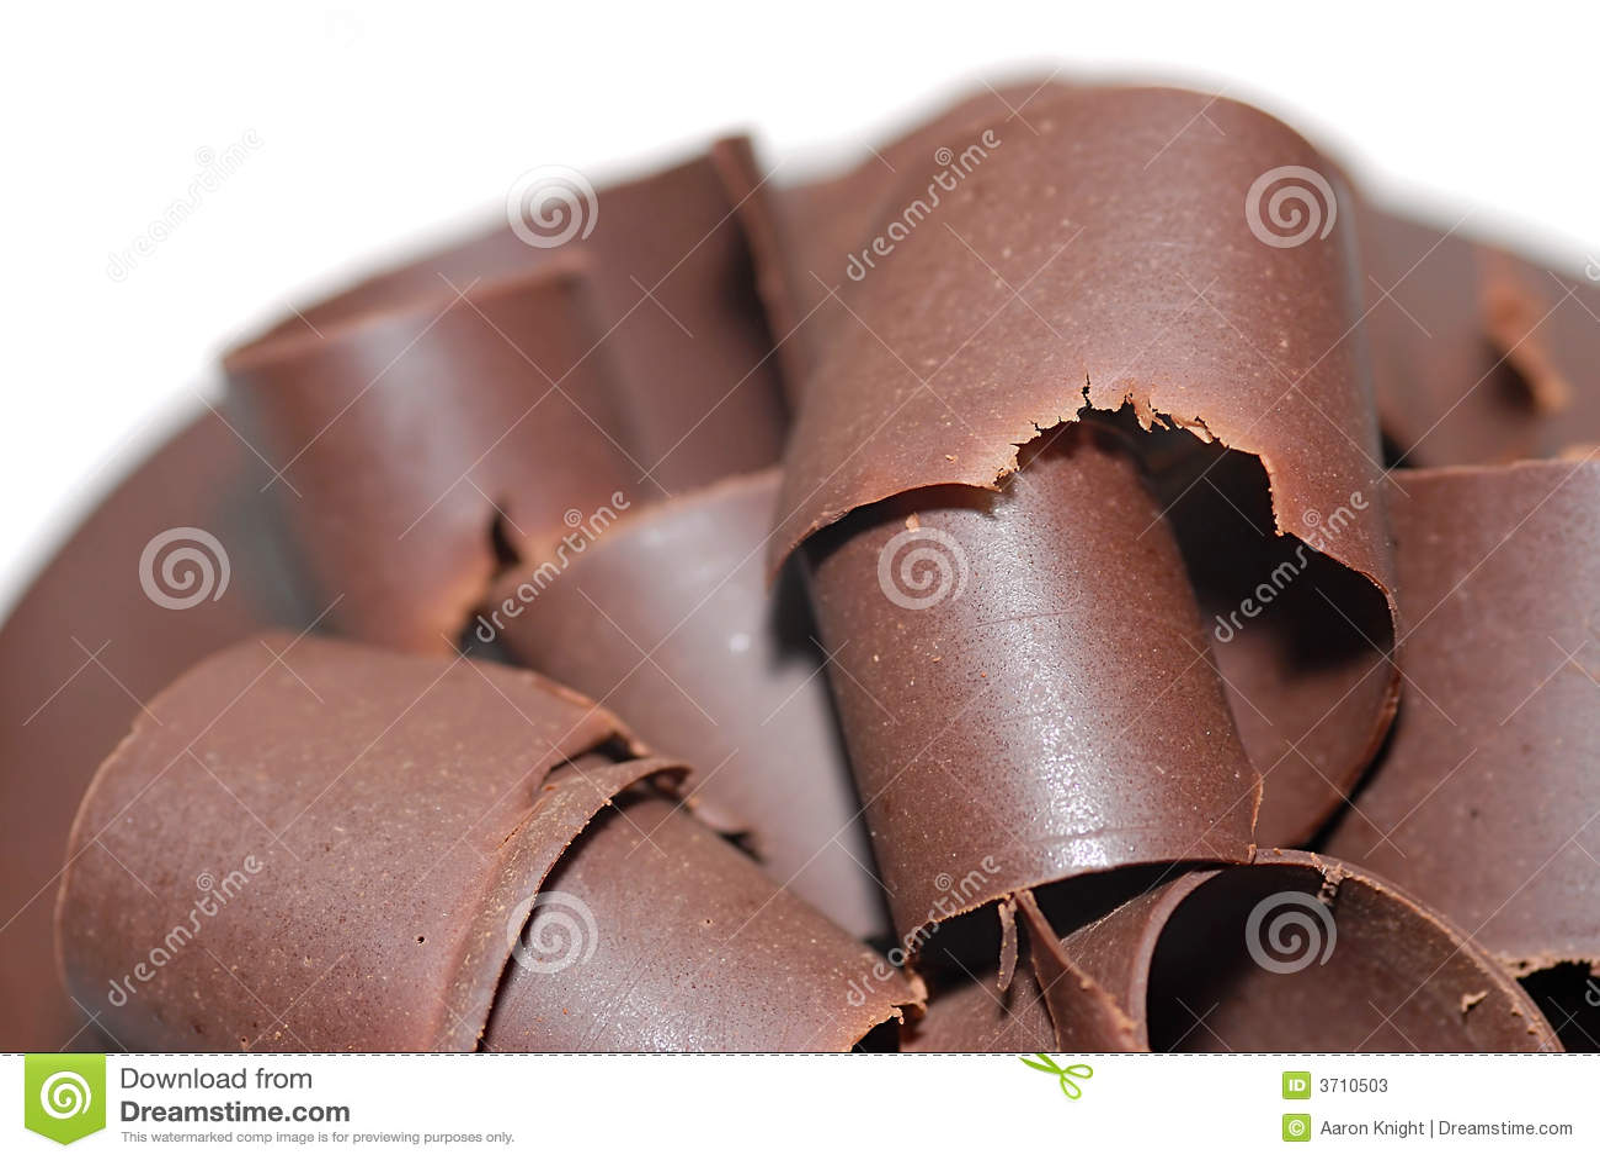 Chocolat frais rasé